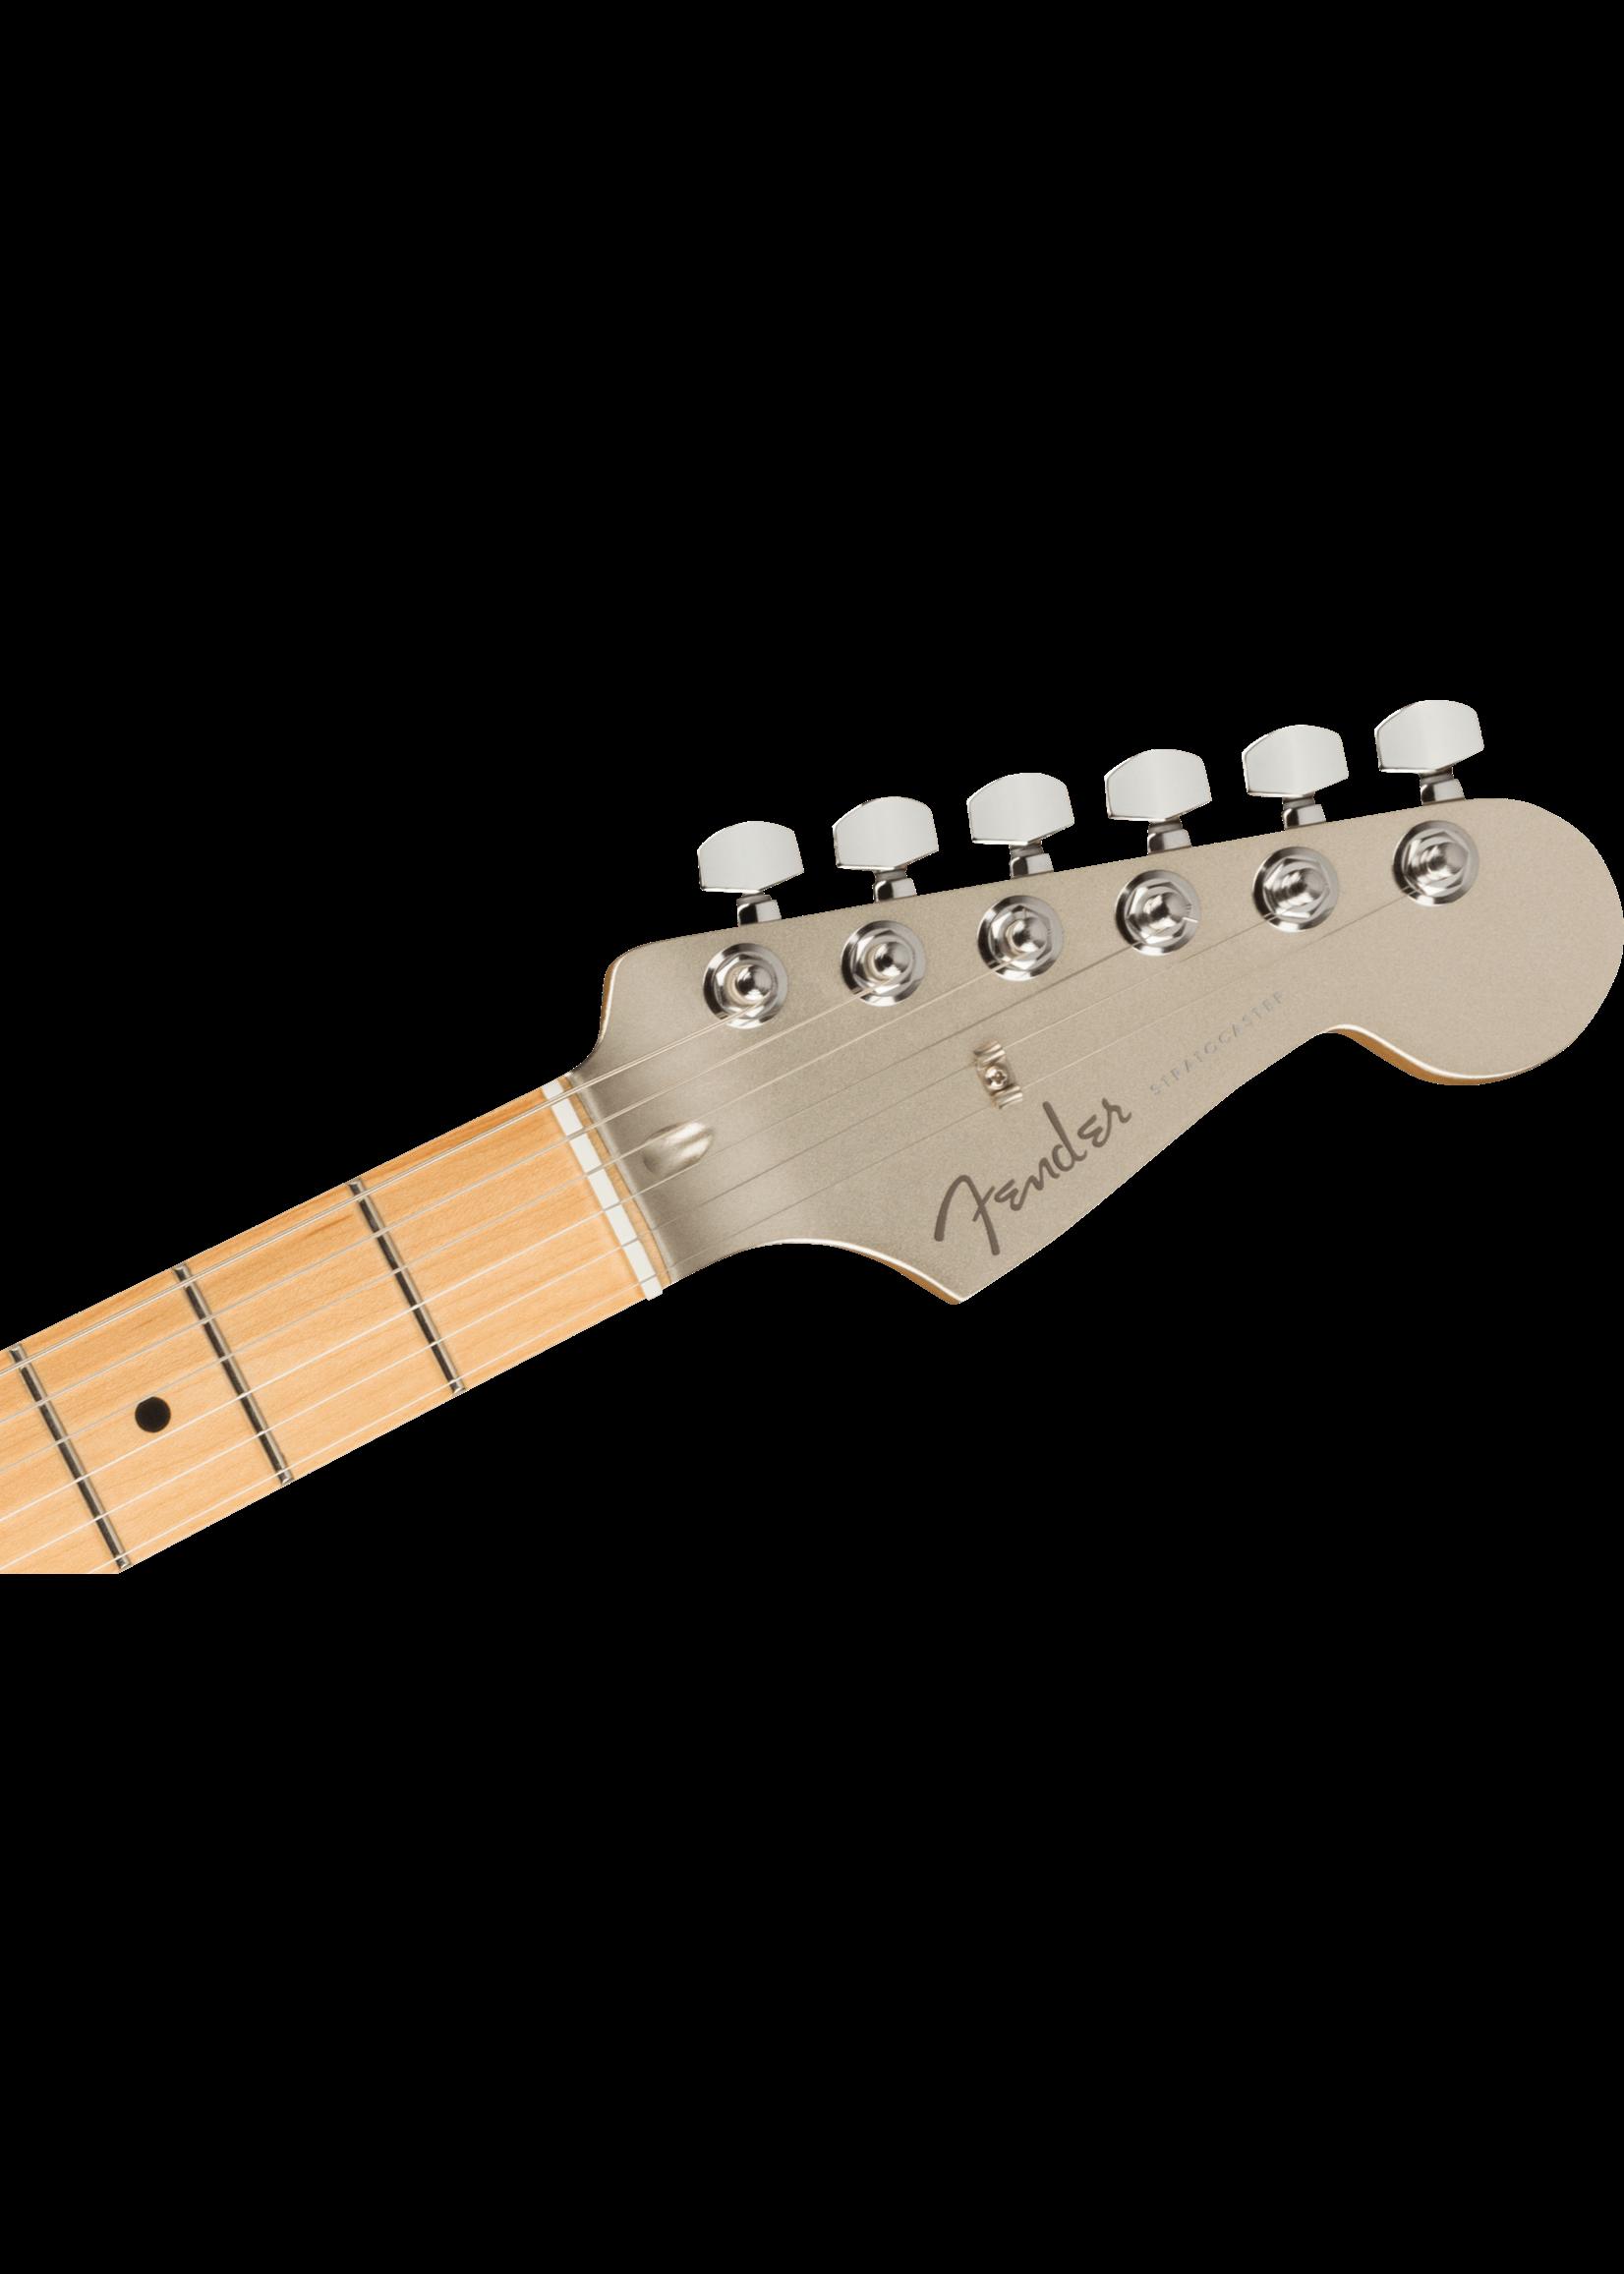 Fender Fender 75th Anniversary Stratocaster Diamond Anniversary